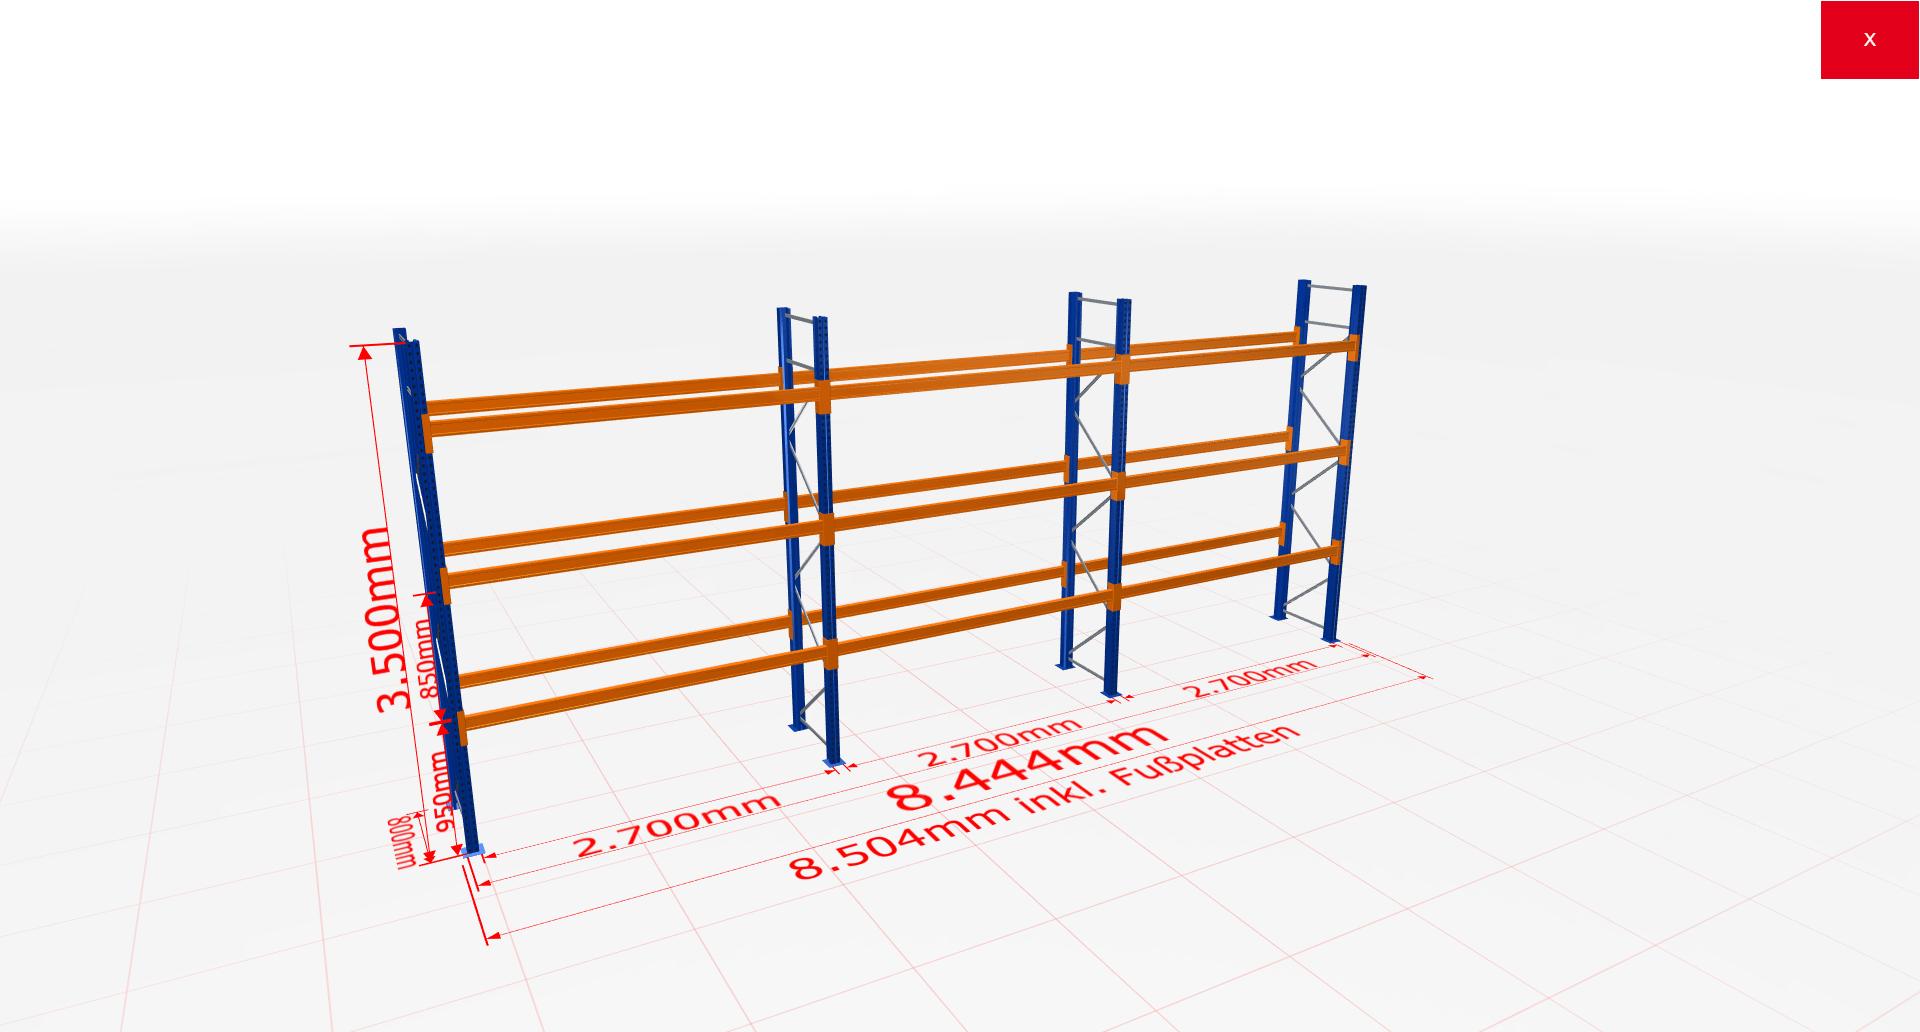 Palettenregal Komplettregal 3500x8444x800 mm (HxBxT) 3 Fachebenen SCHULTE Lagertechnik